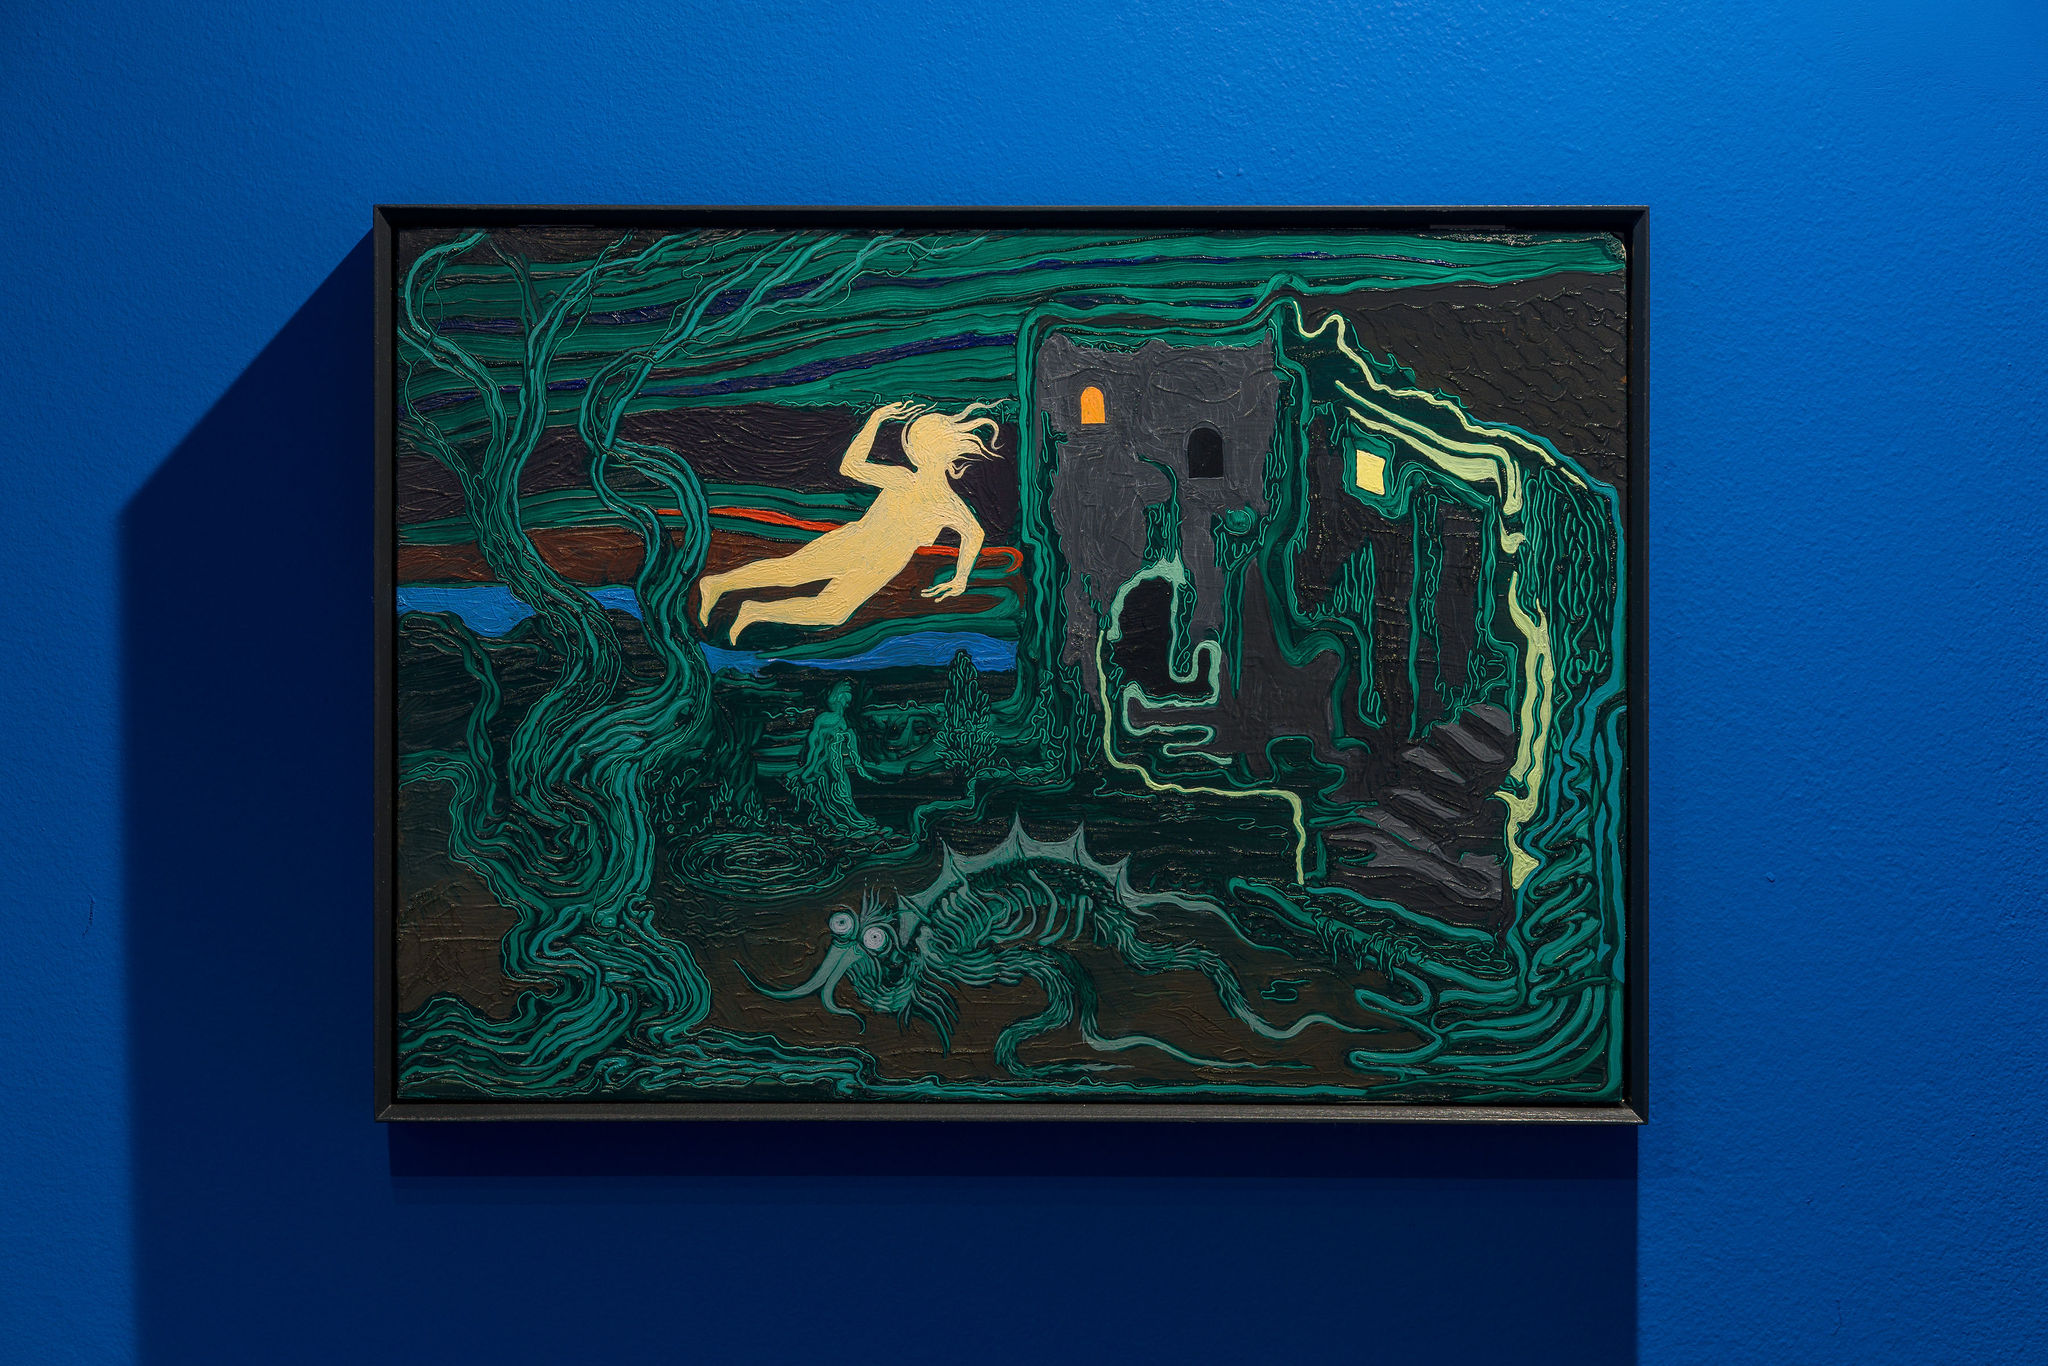 Hortensia Mi Kafchin, Recent dream, 2021, Oil on wood